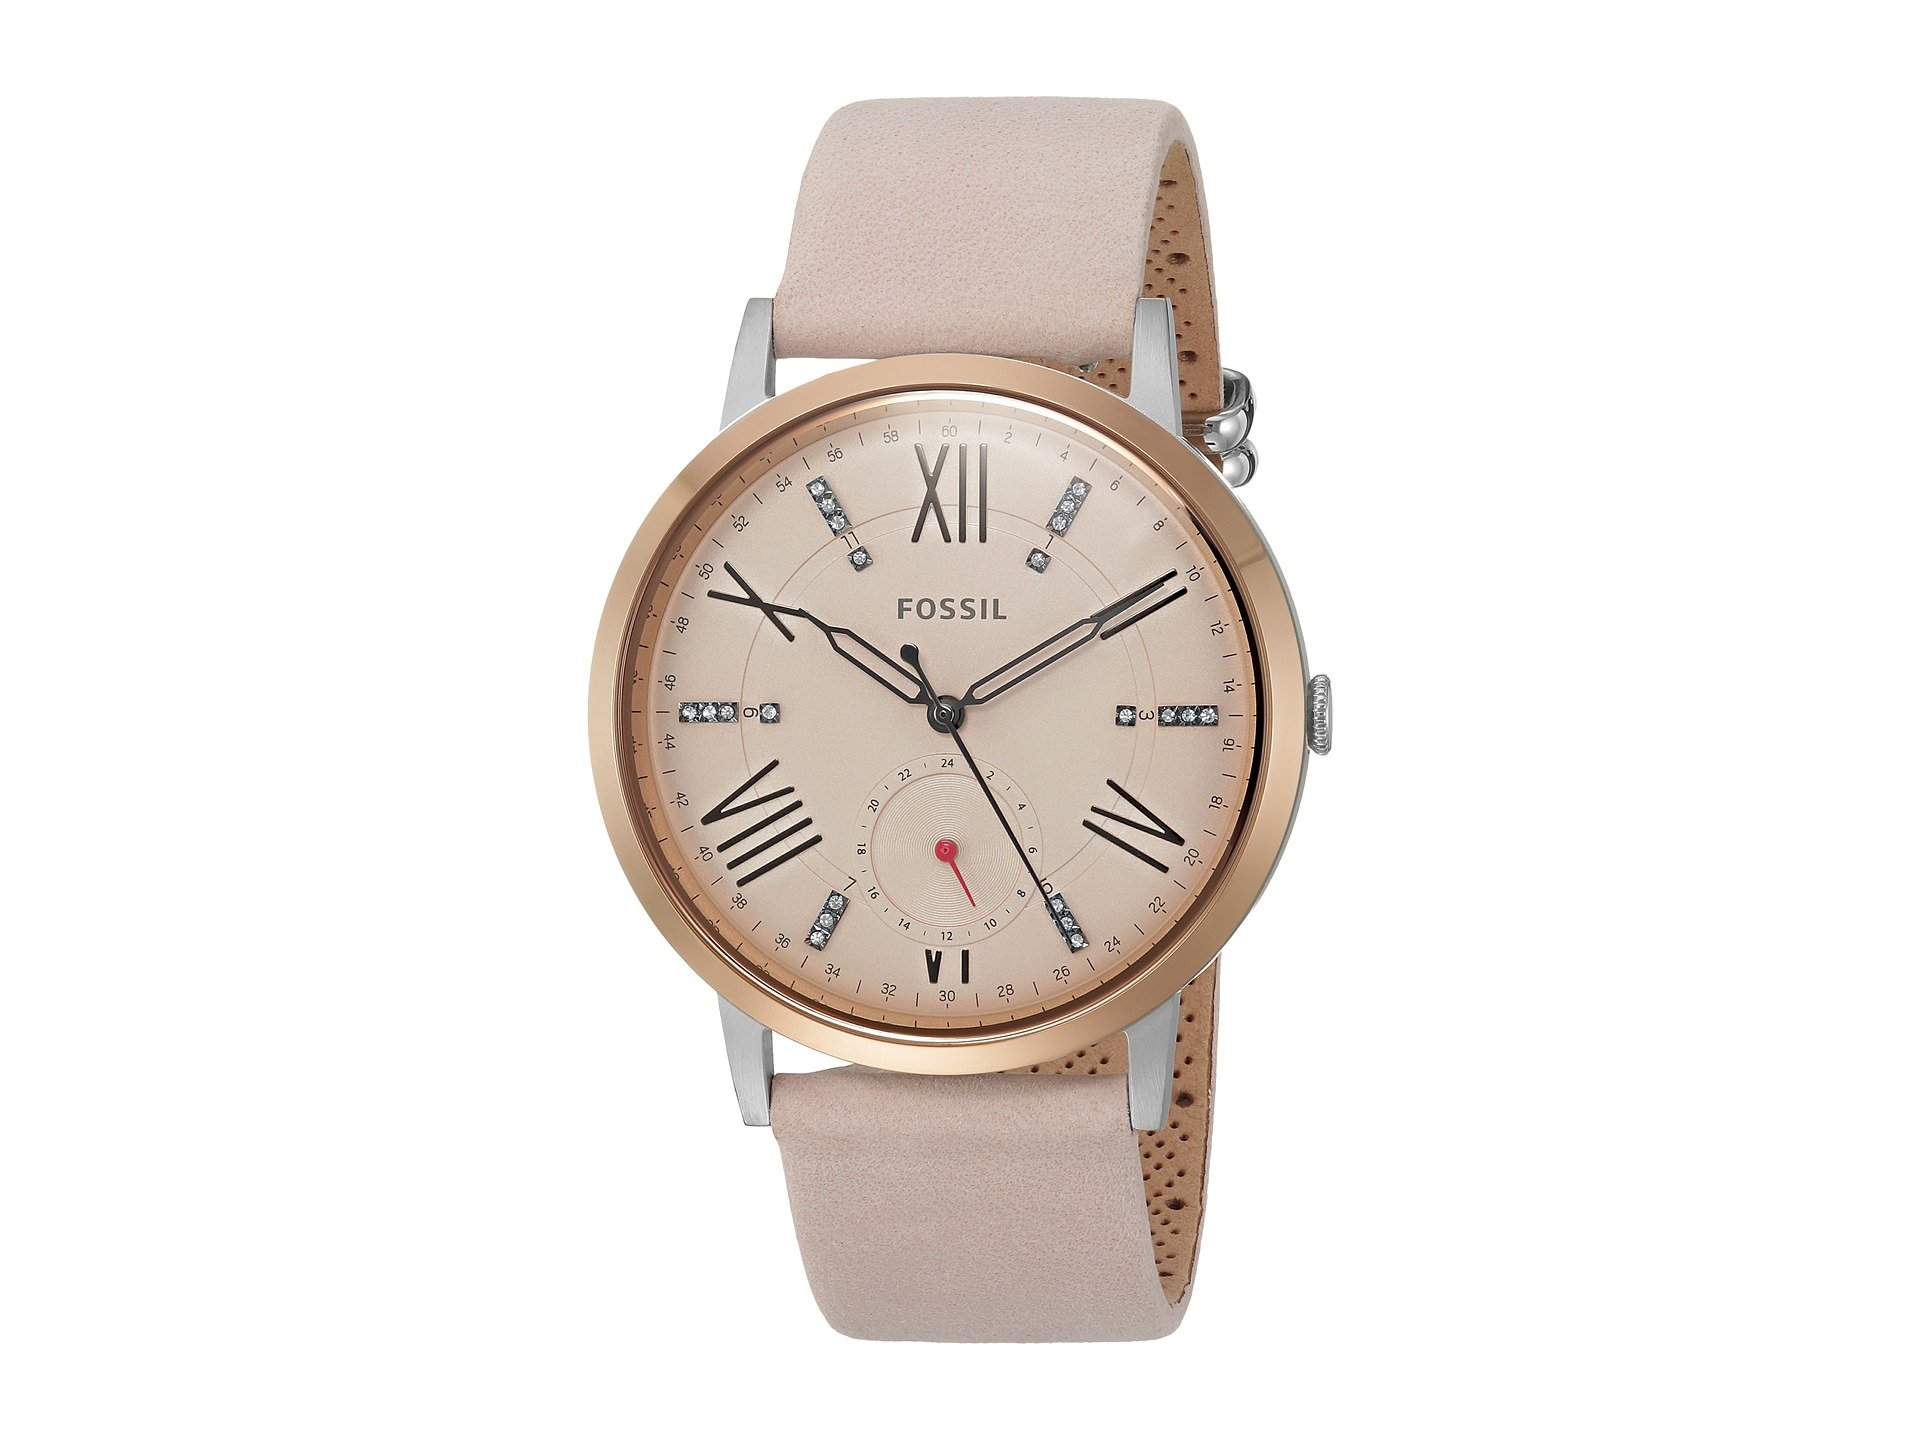 Reloj para Mujer Fossil Gazer Leather - ES4163  + Fossil en VeoyCompro.net